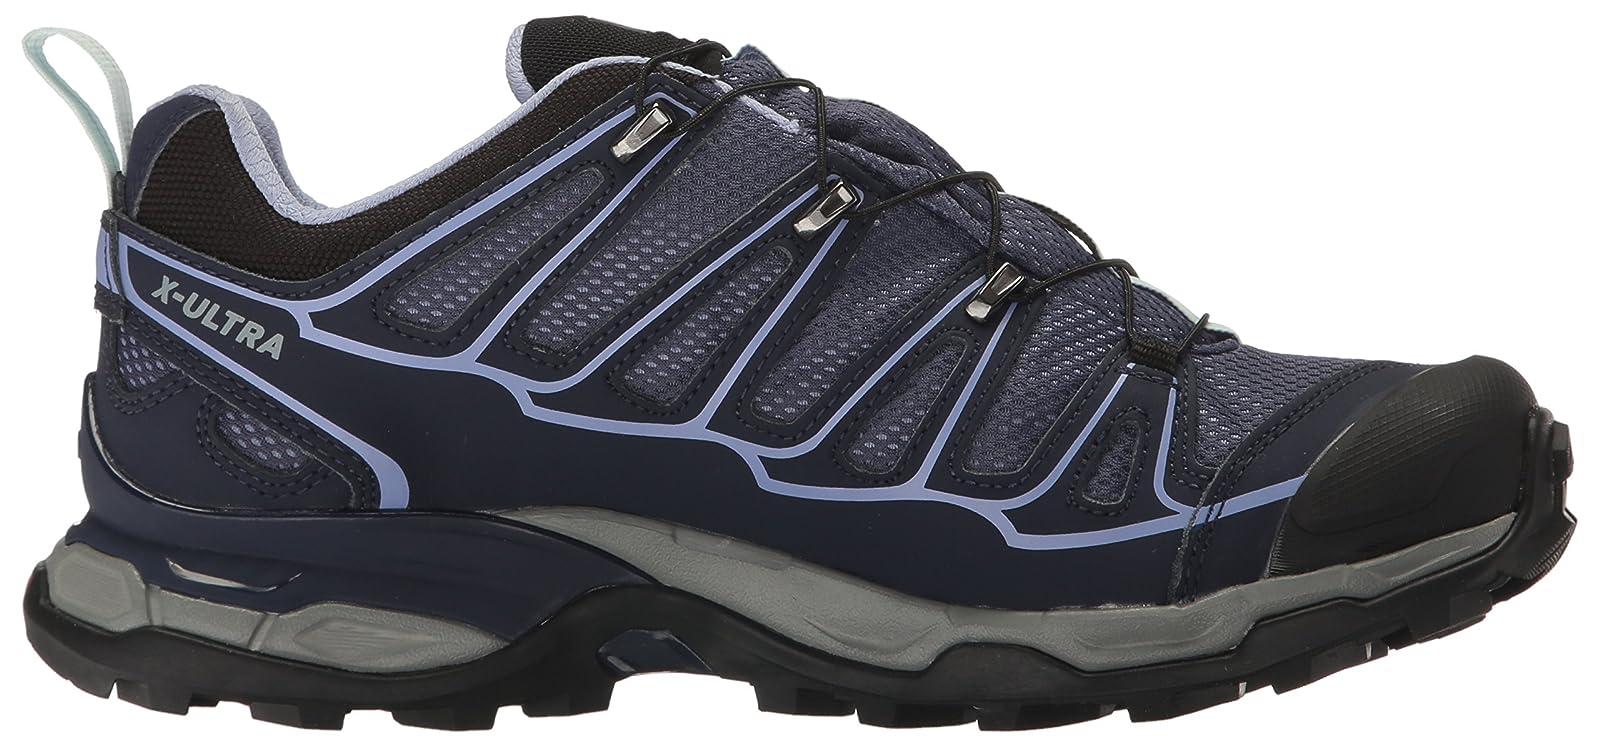 Salomon Women's X Ultra 2 GTX W Hiking Shoe 7 M US - 7